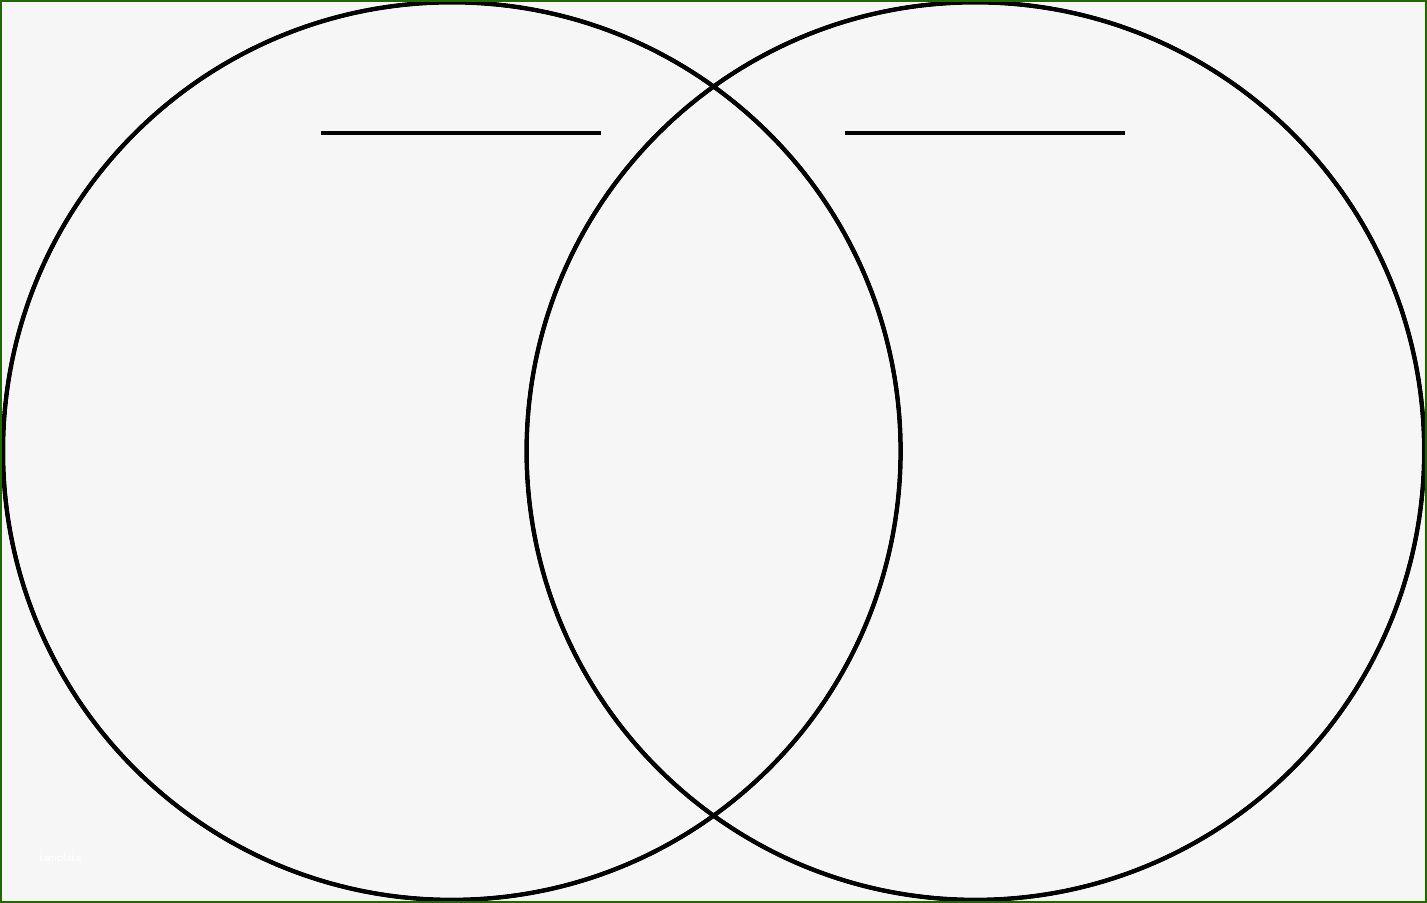 Venn Diagram Template Doc: 19 Design for 2020 in 2020